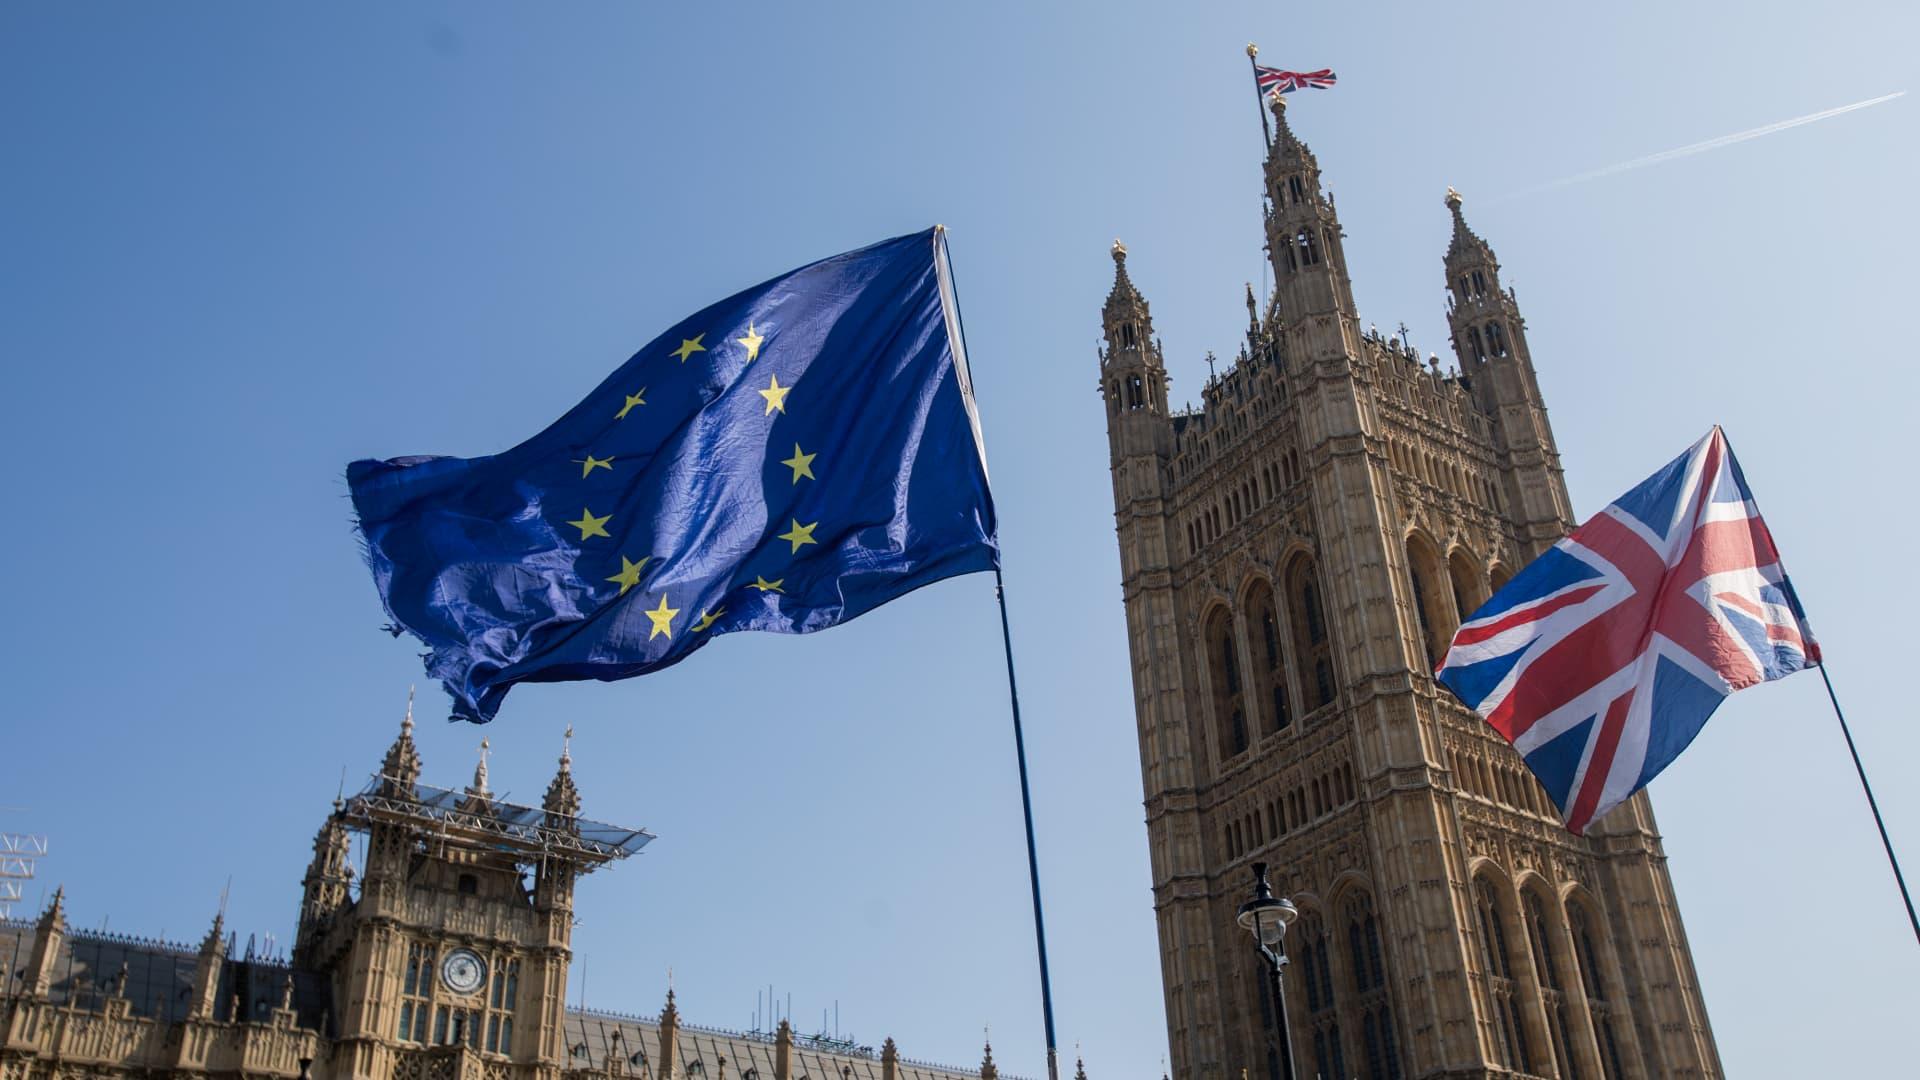 A European Union (EU) flies alongside a British Union flag, also known as a Union Jack in London.